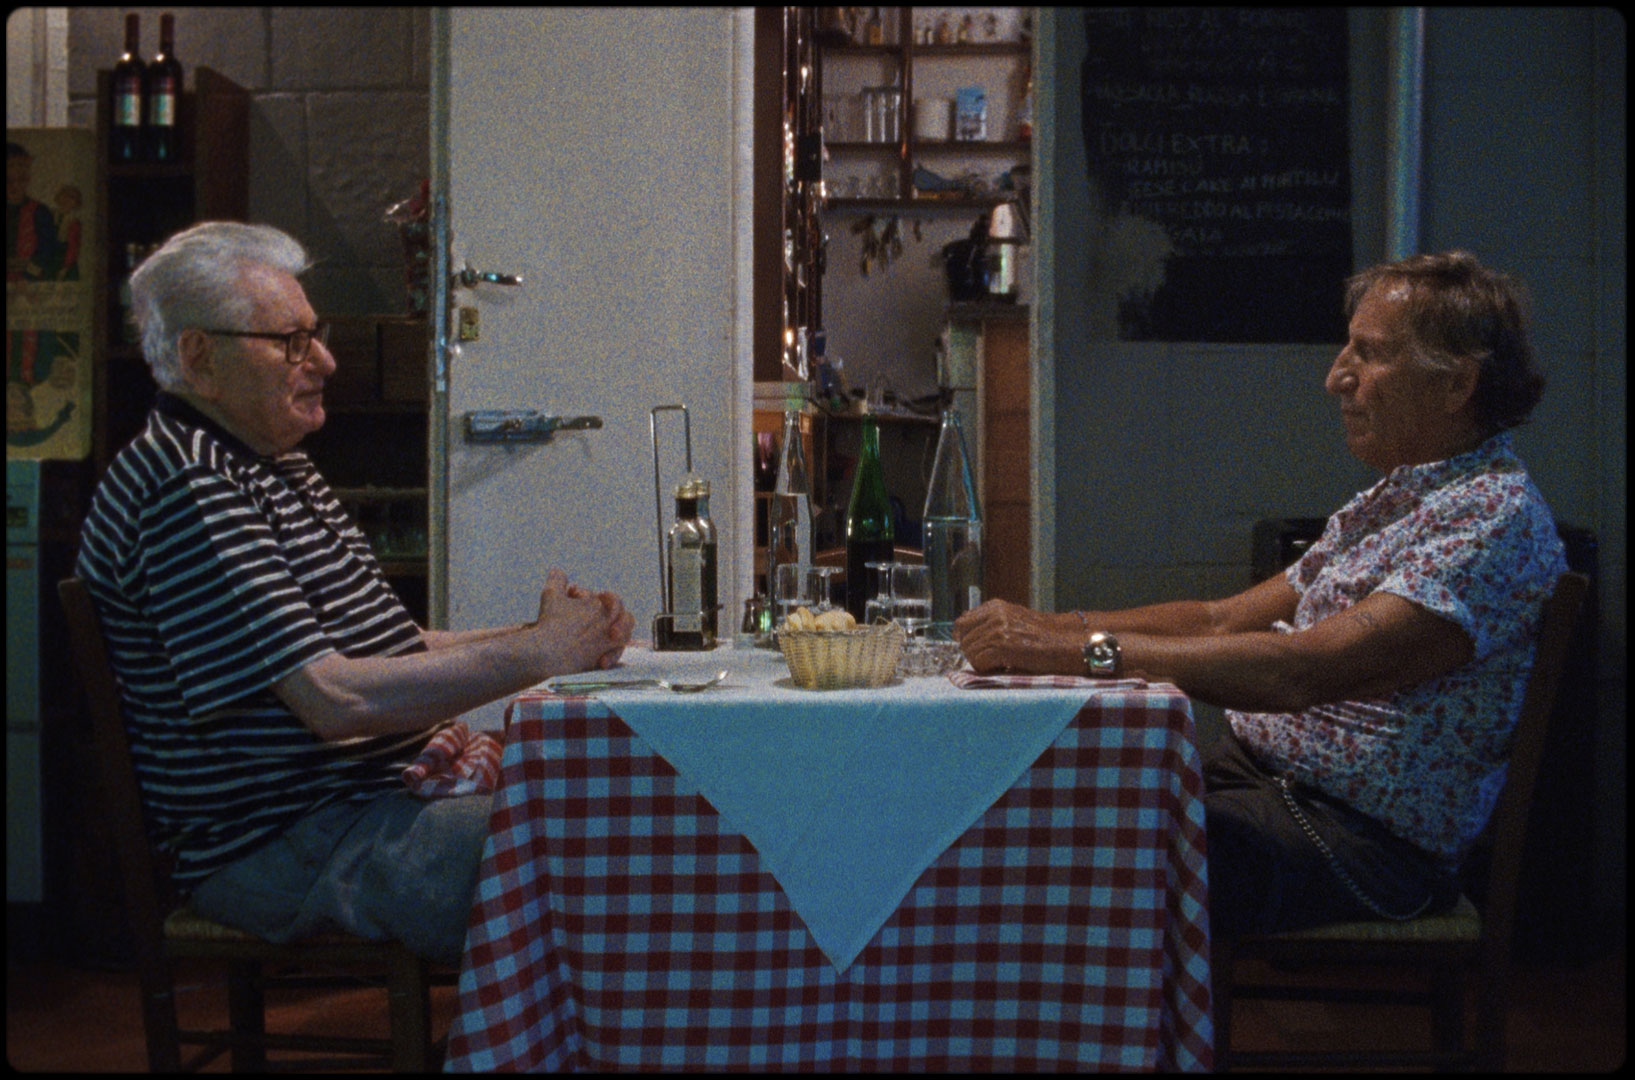 Umberto Righi e Stefano Bonaga